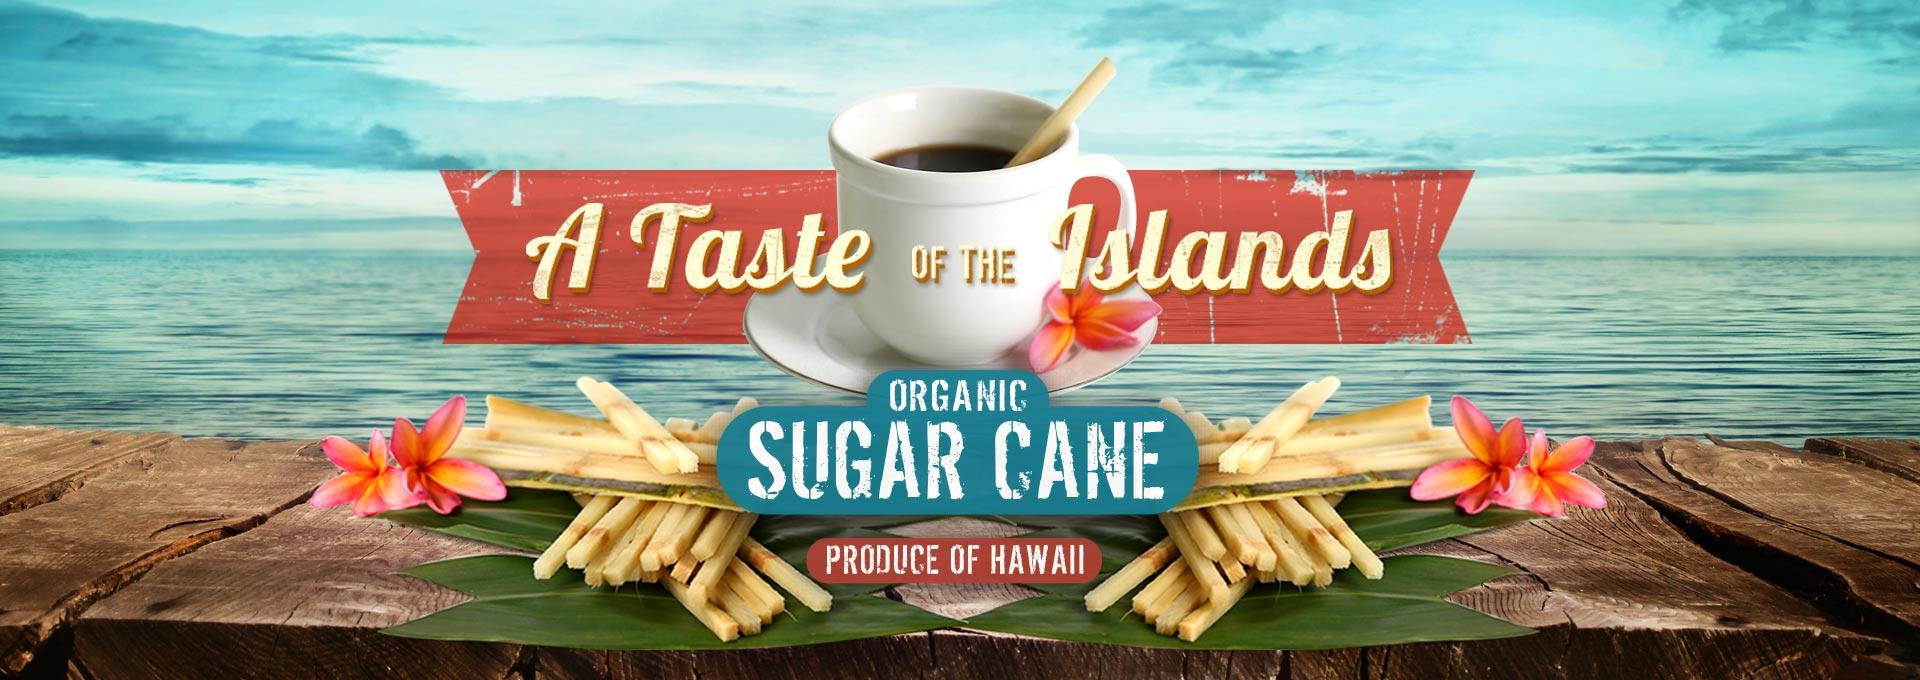 Coffee Stirrers - Sugar Cane Sticks